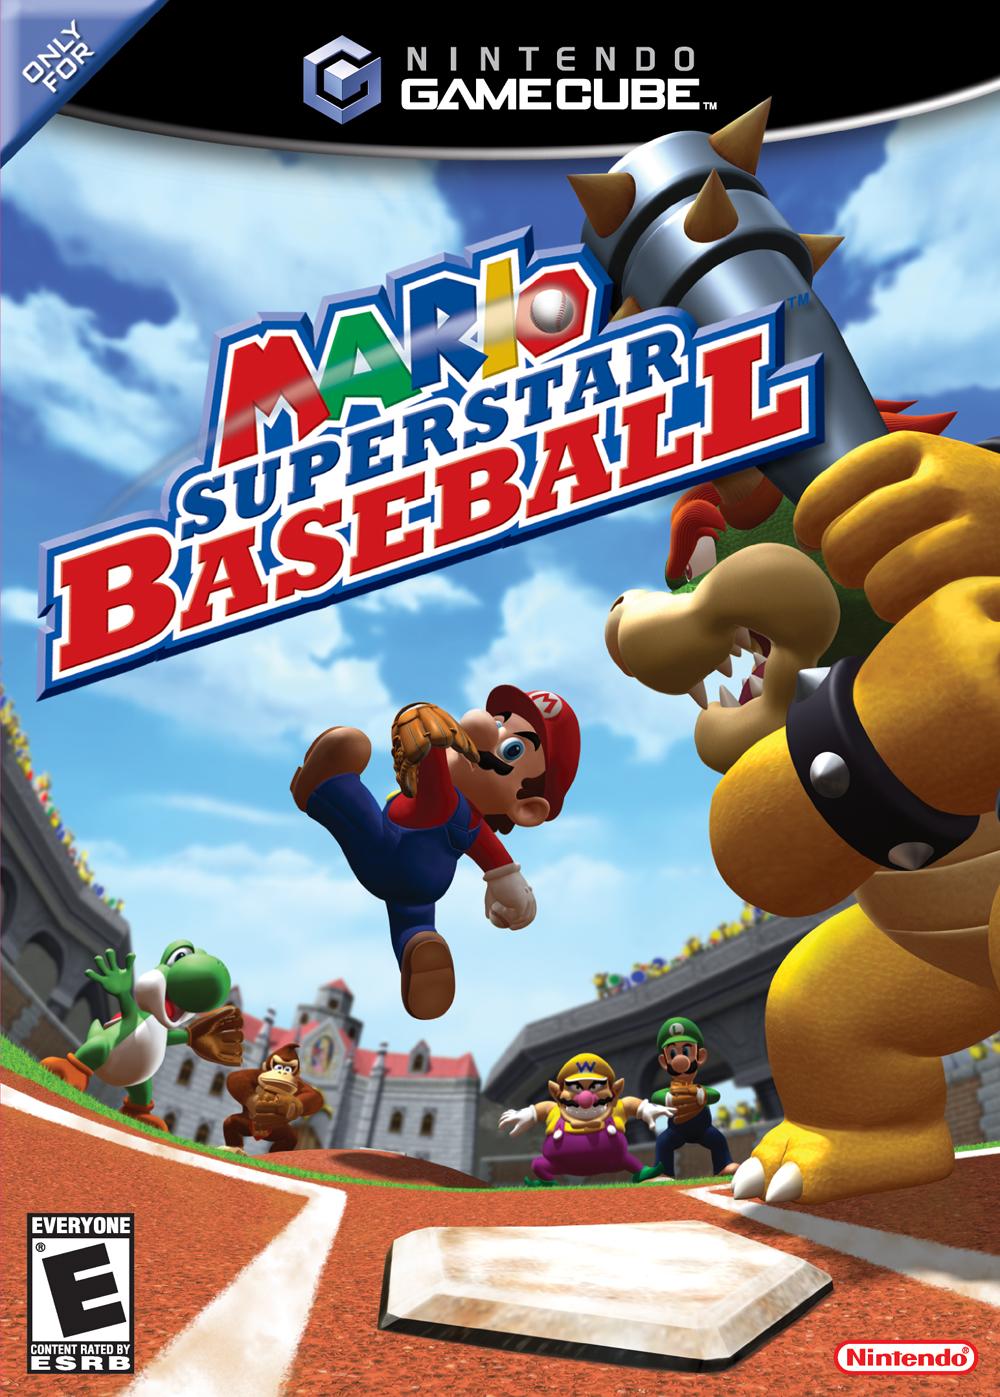 Summary Nintendo Gamecube Super Mario Wiki The Encyclopedia Luigi Circuit Wii